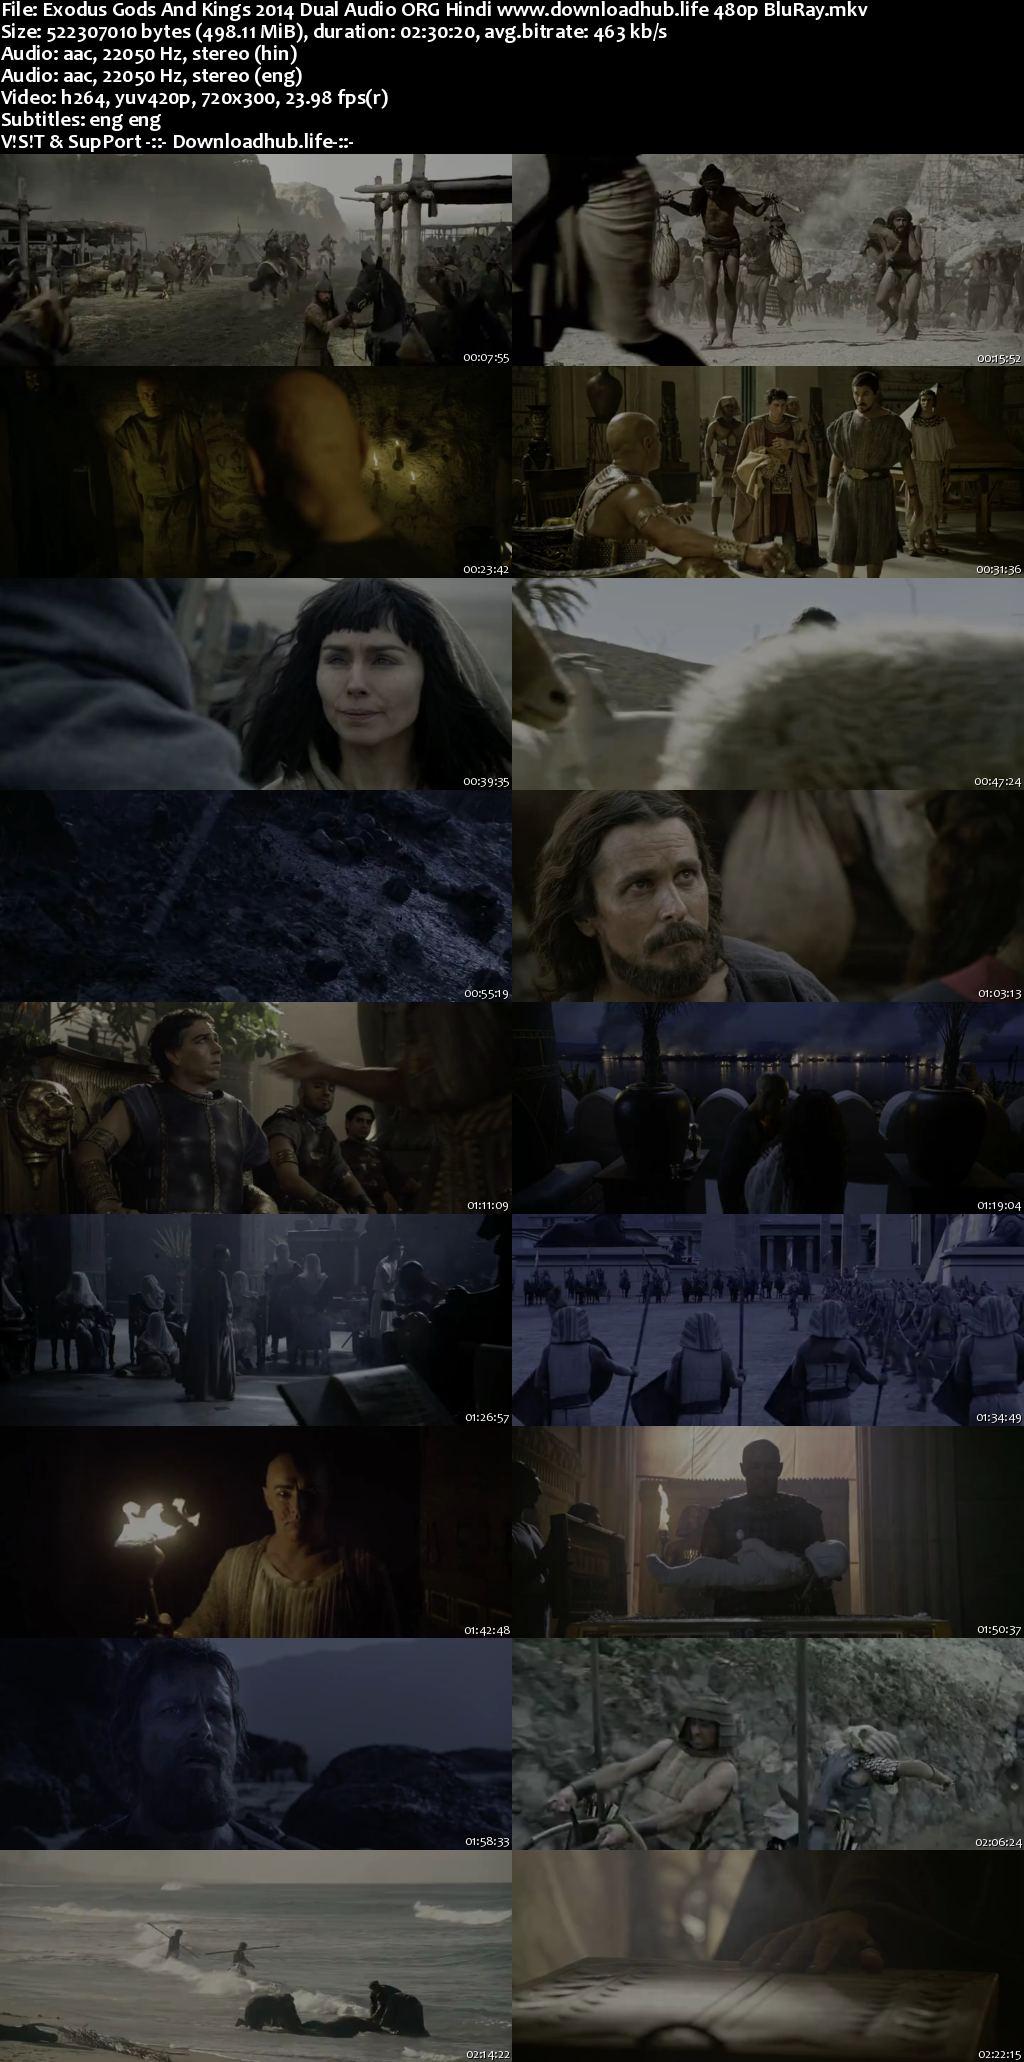 Exodus Gods and Kings 2014 Hindi Dual Audio 500MB BluRay 480p ESubs